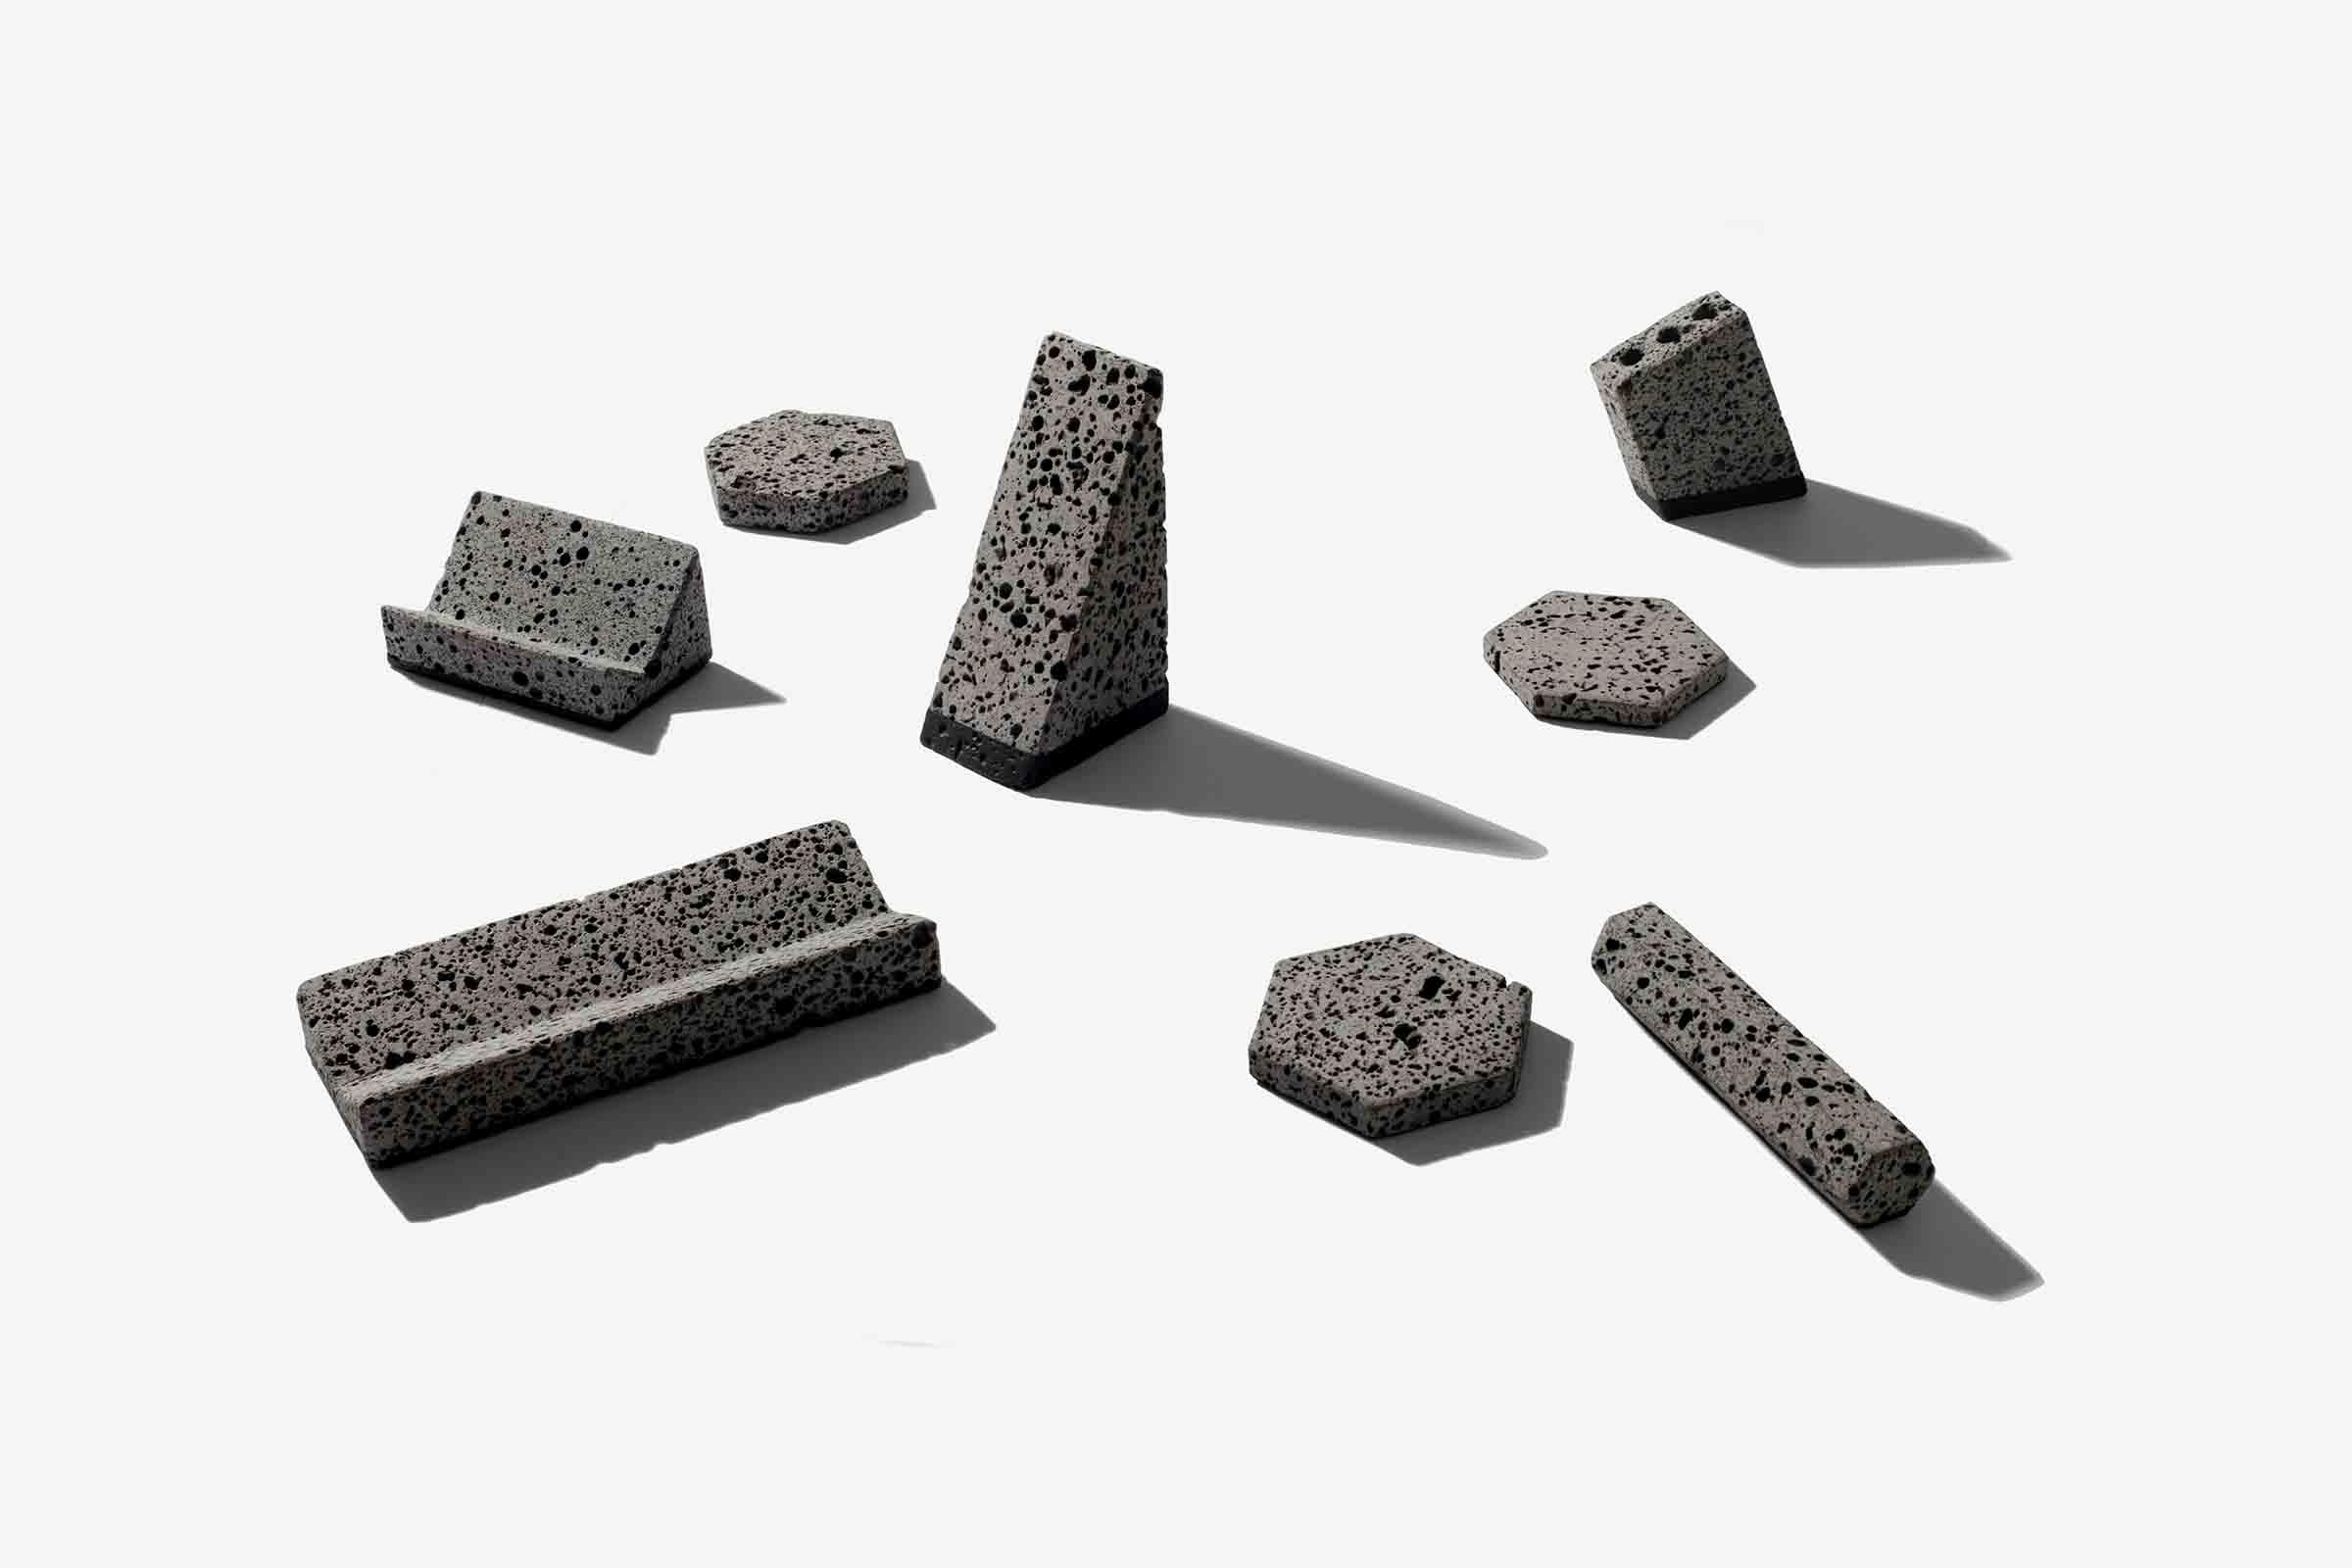 'Basalt' desktop accessories from Jeonghwa Seo